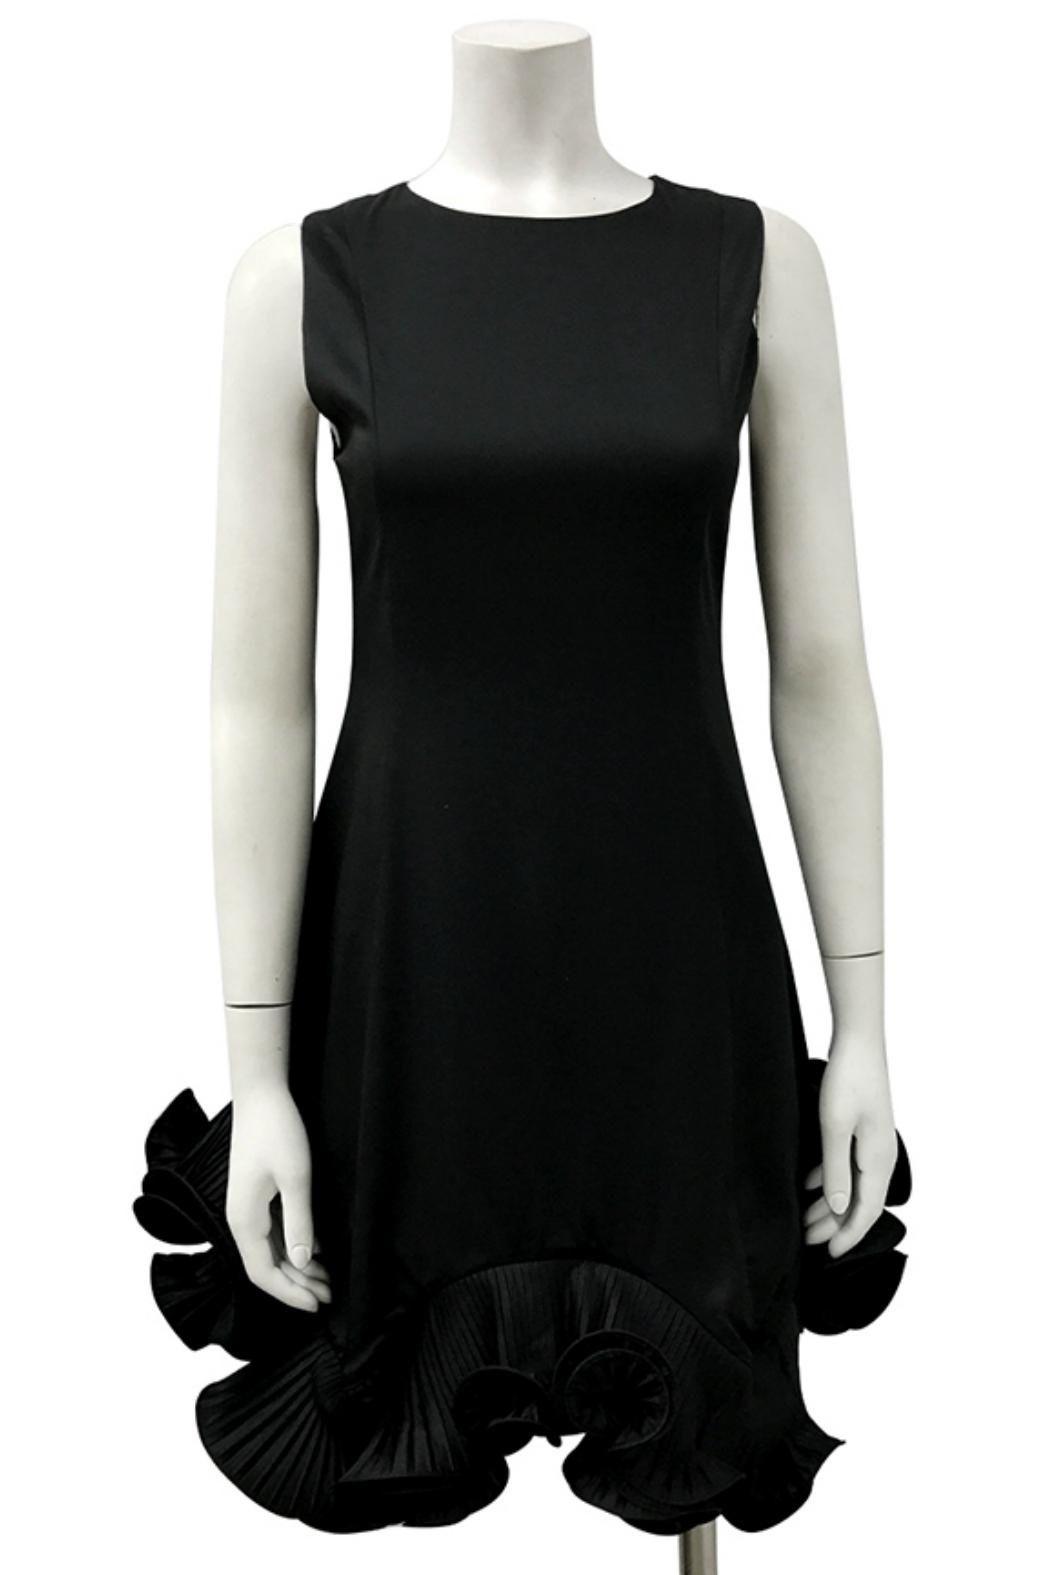 Bottom Pleats Dress Pleats Dress Dresses Black Sleeveless Dress [ 1575 x 1050 Pixel ]